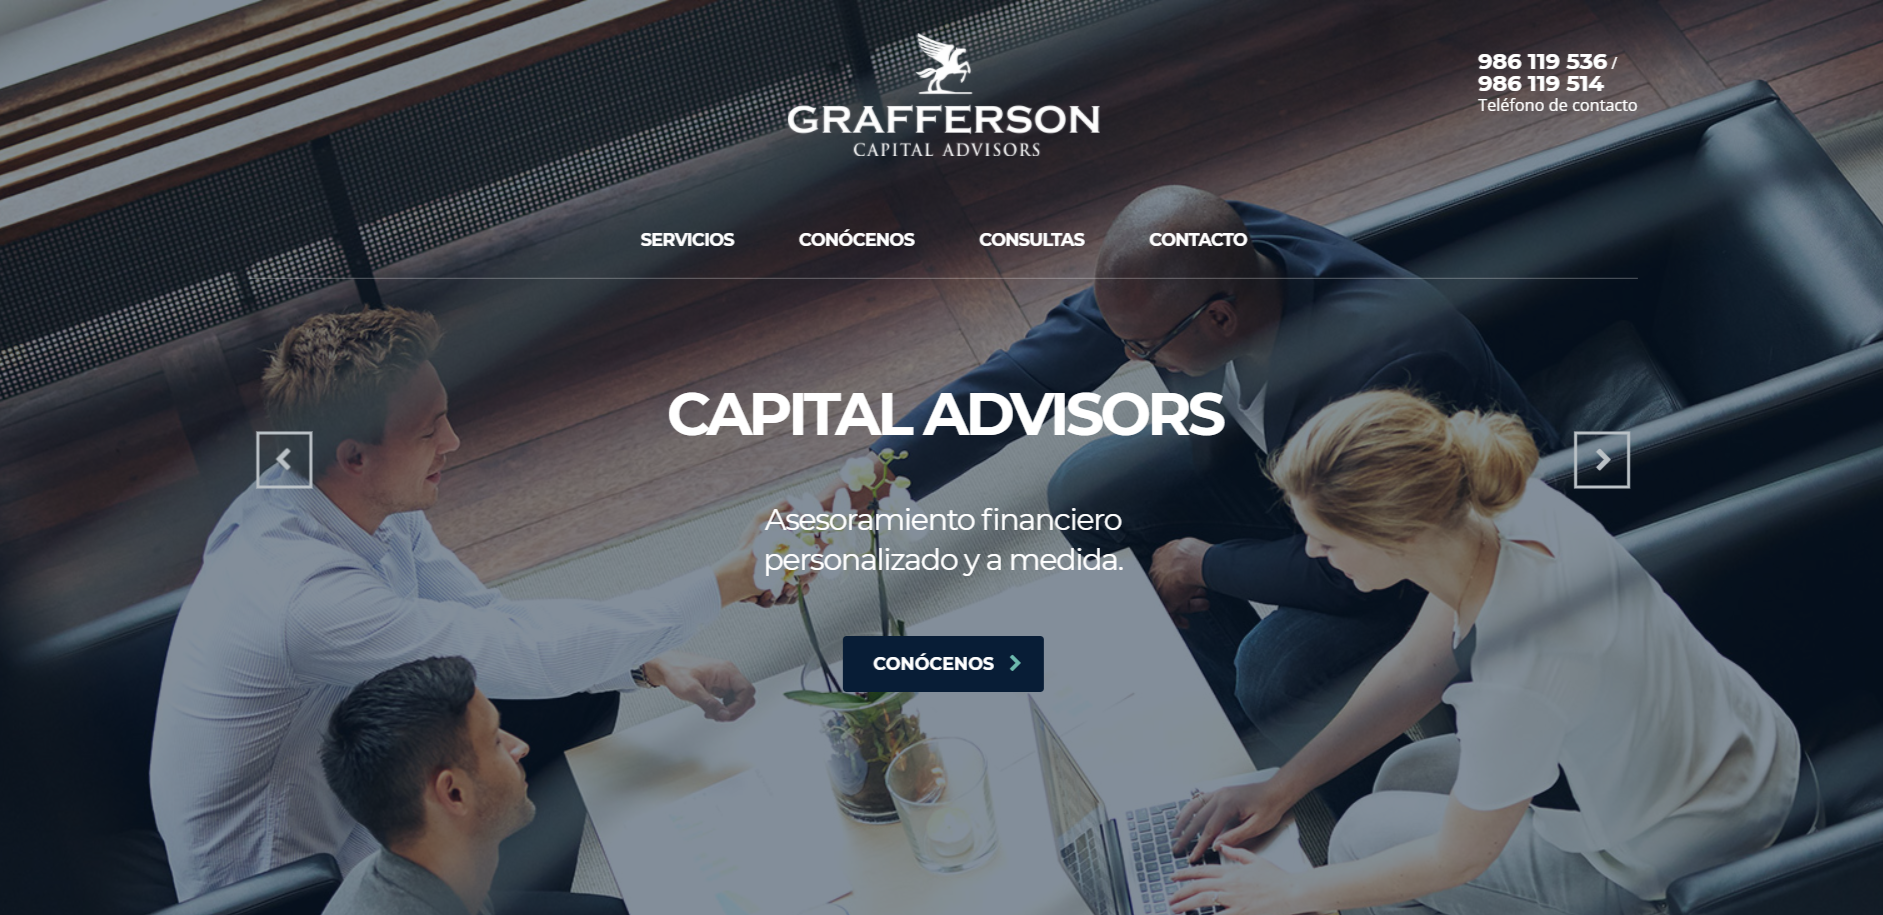 Grafferson Capital Advisors